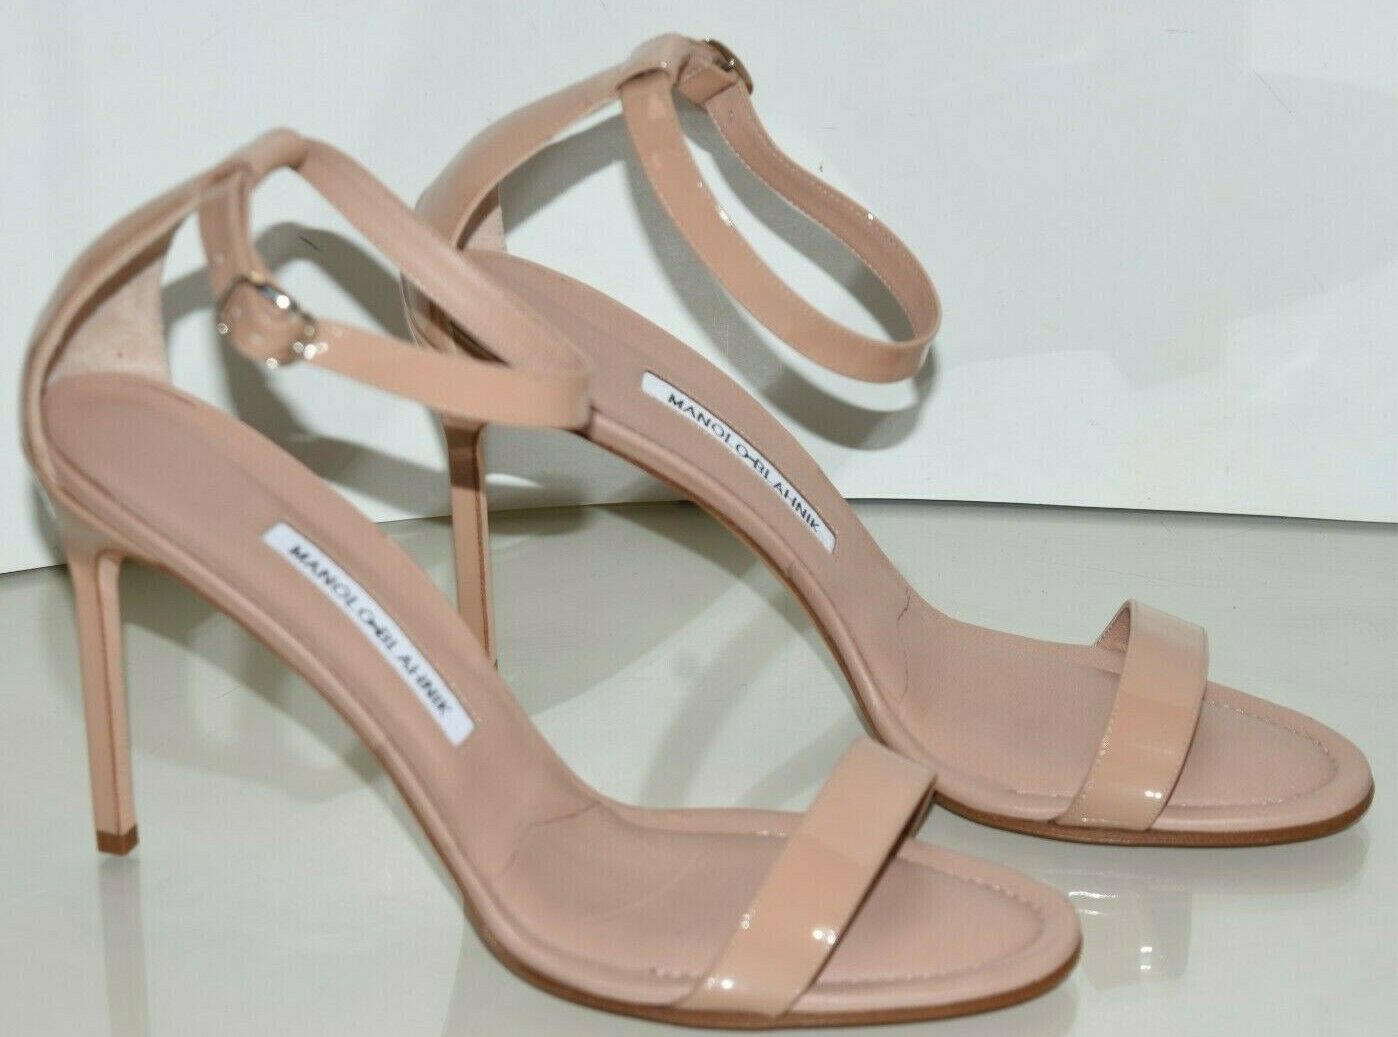 NUOVO Manolo Blahnik CHAOS  Patent Leather Sandals Heel NUl Beige Strappy scarpe 41  online economico